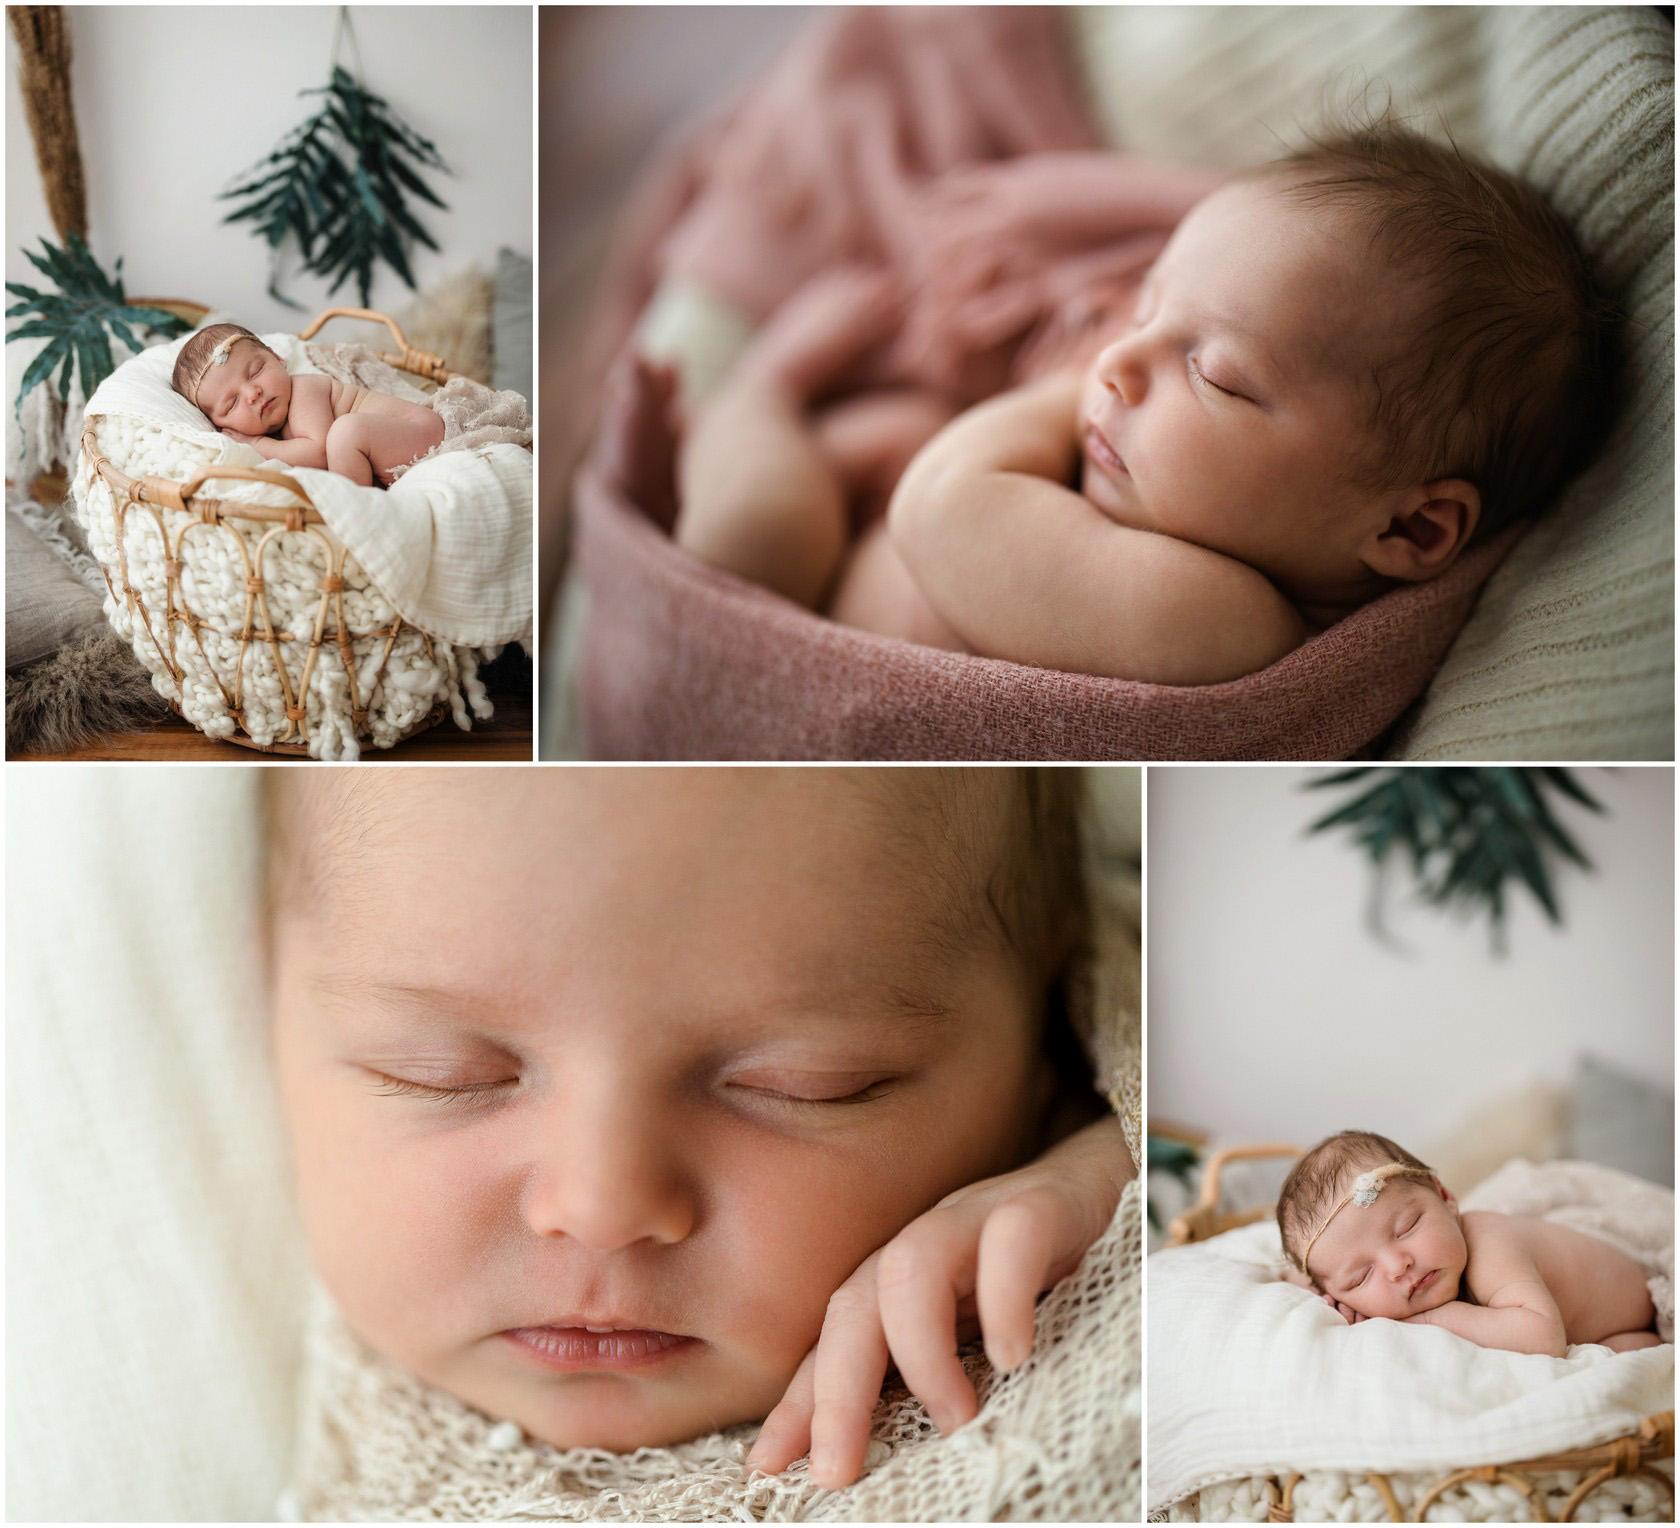 Newborn Photos im Moho-Stil